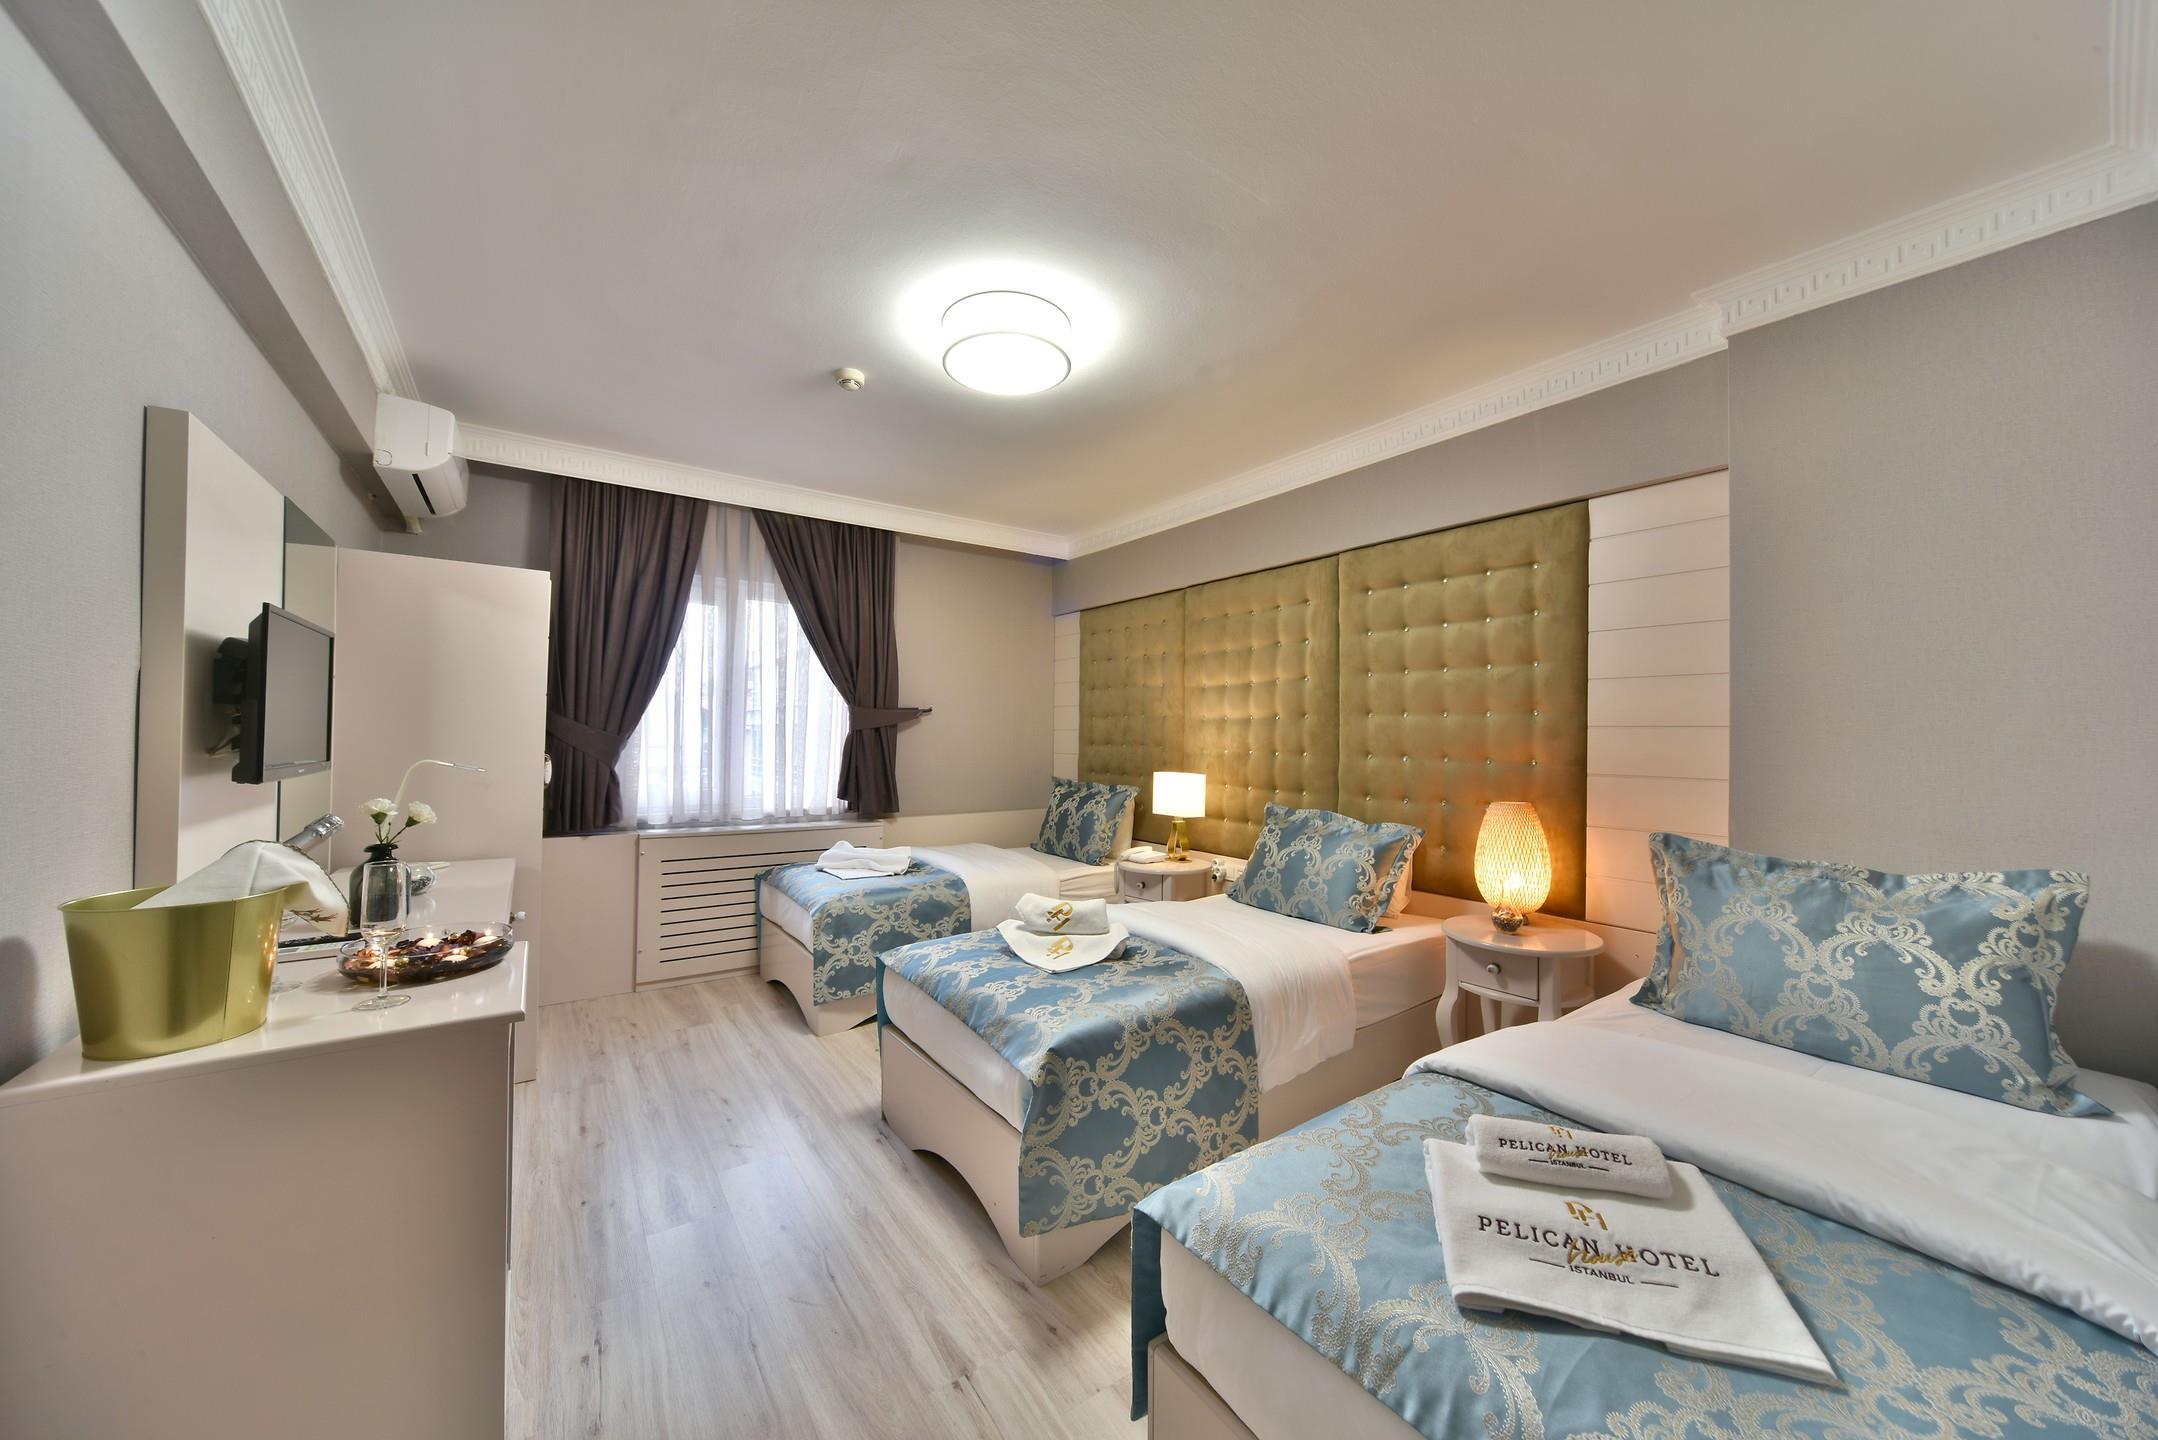 Pelican House Hotel258563